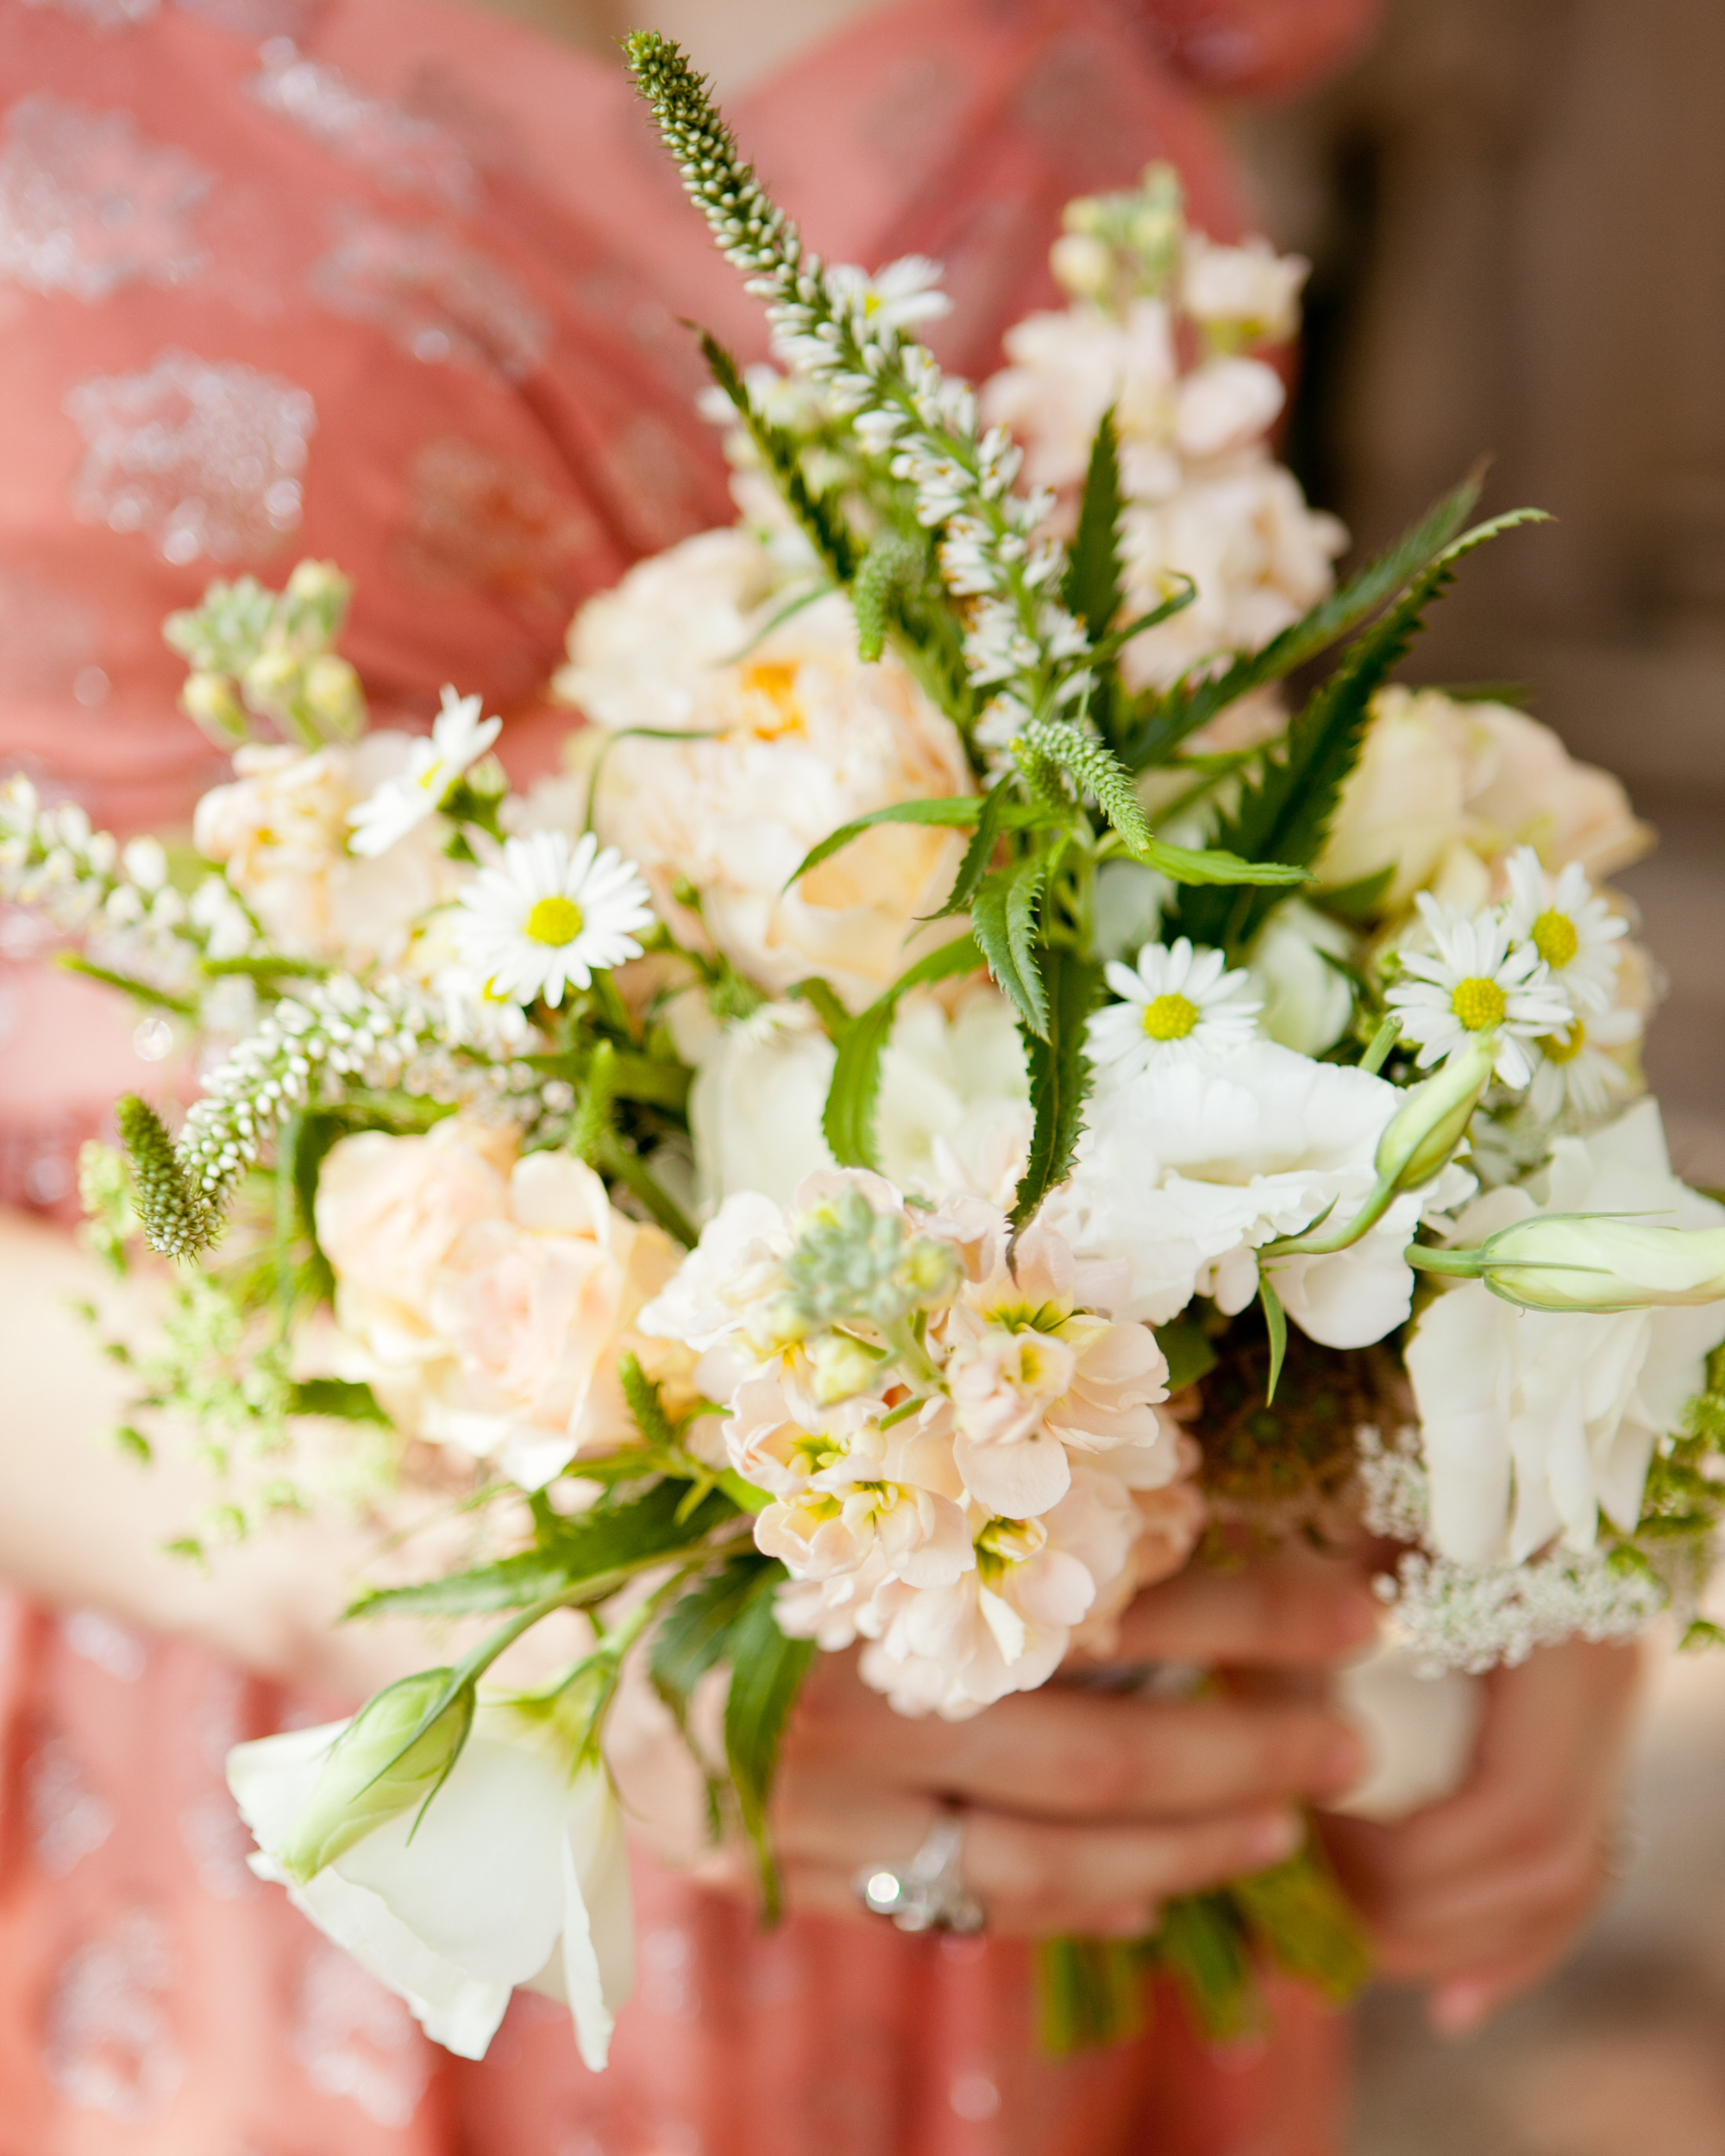 allison-tyler-bouquet-0731-wds110384.jpg